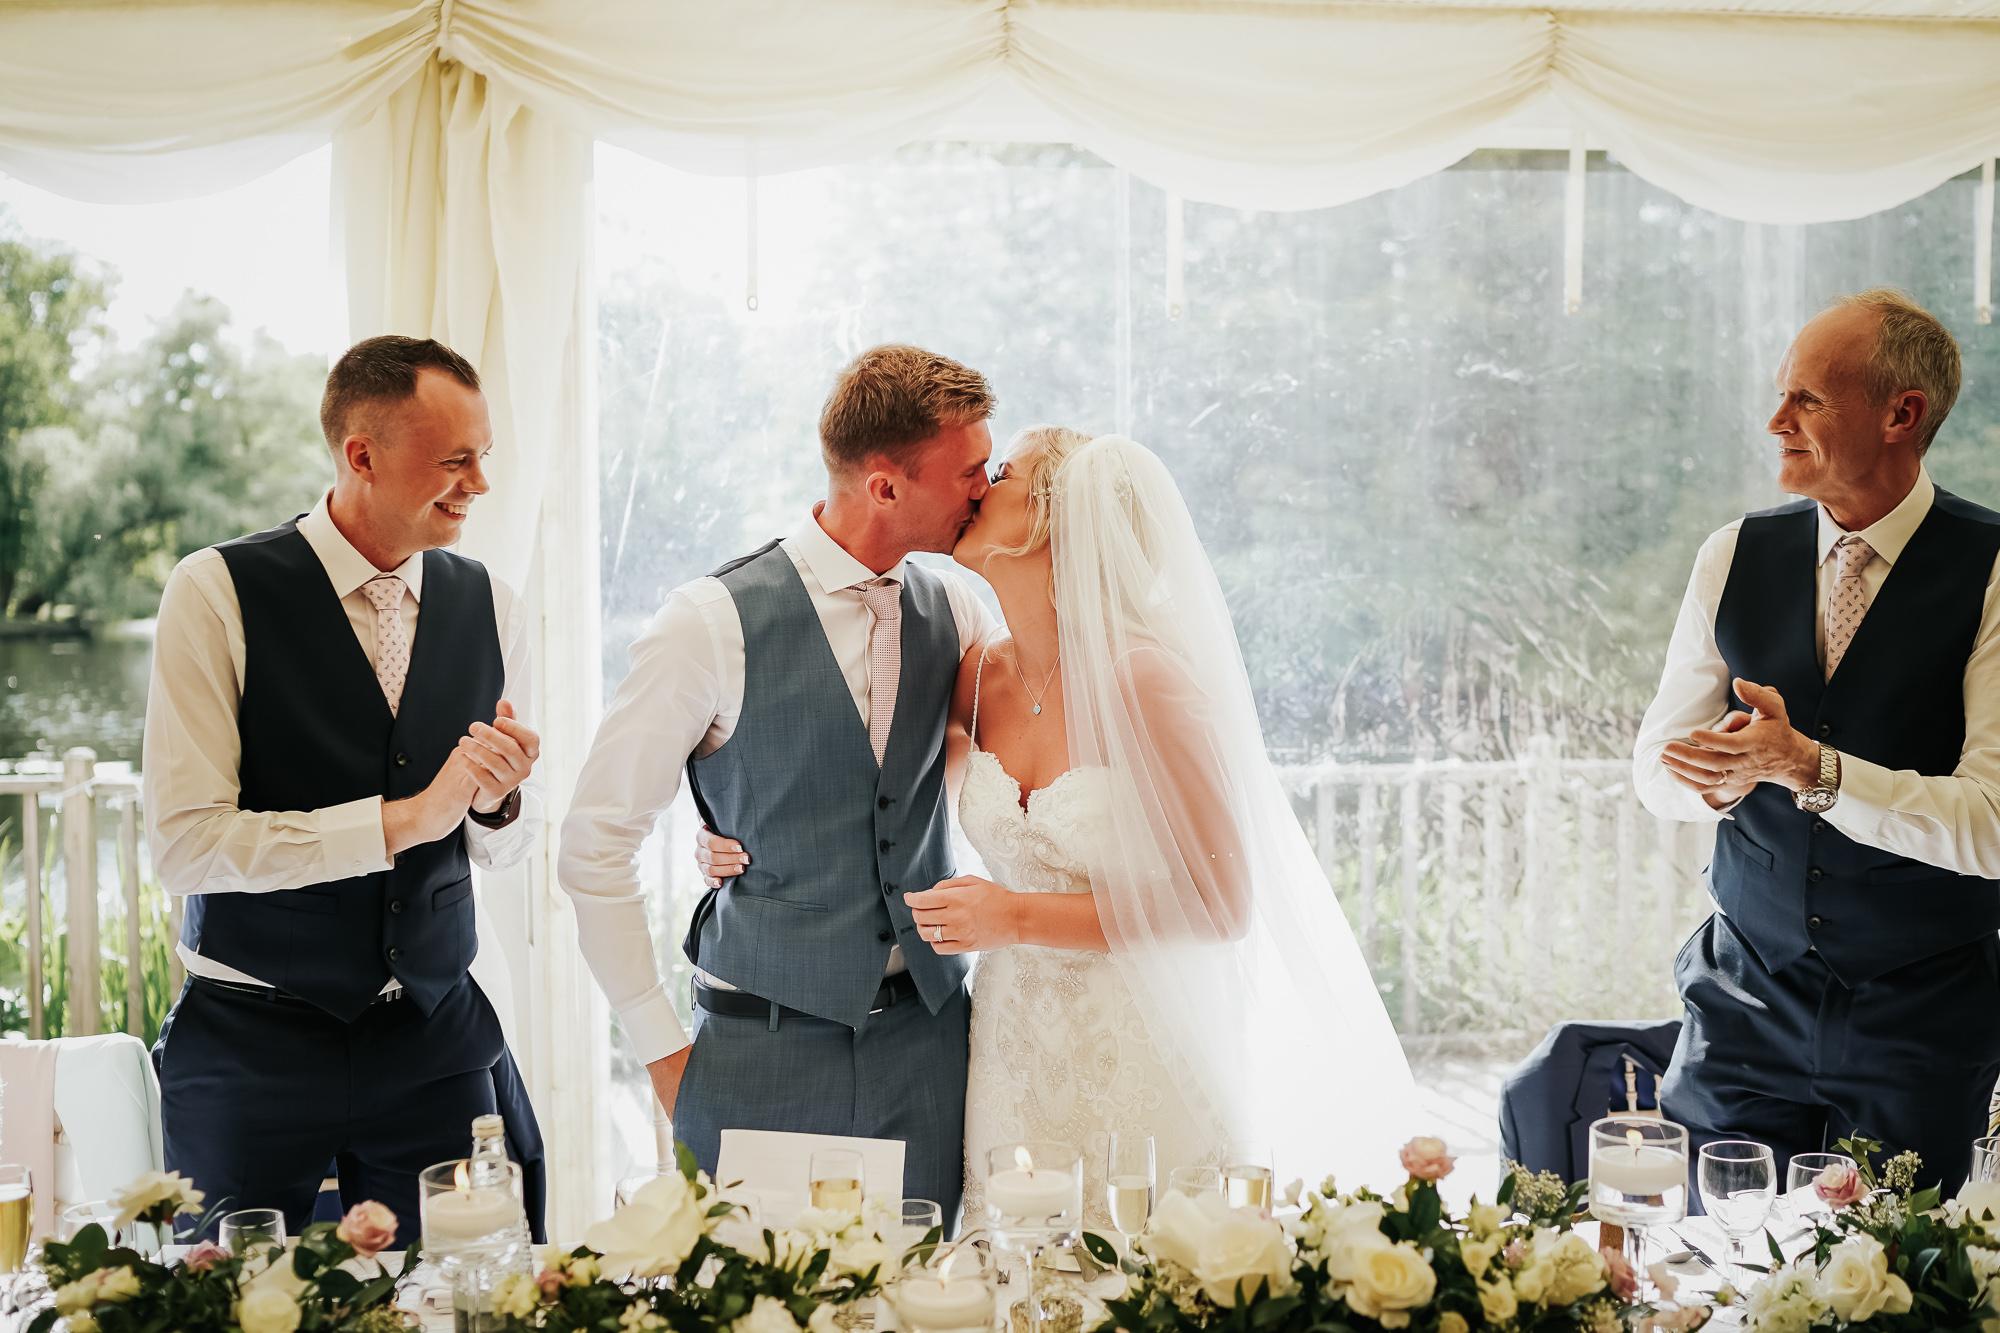 Thornton Manor Lakeside Marquee Wedding Photographer  (44 of 53).jpg